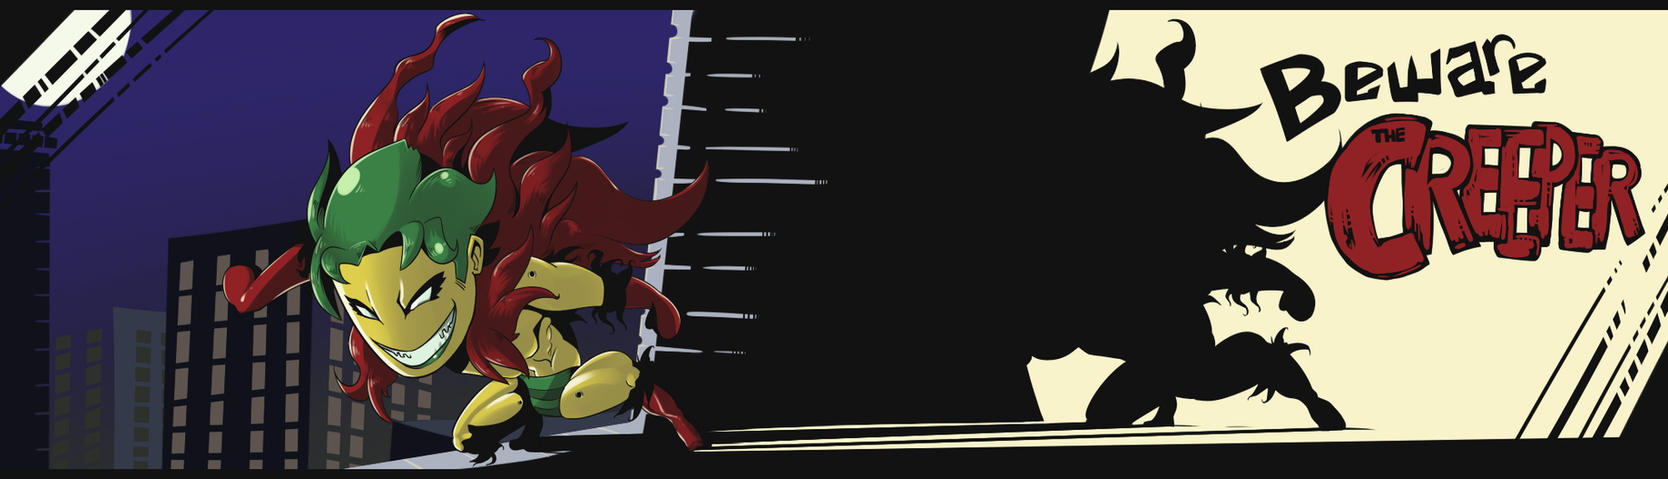 Scribblenauts: Beware The Creeper by 0takuman